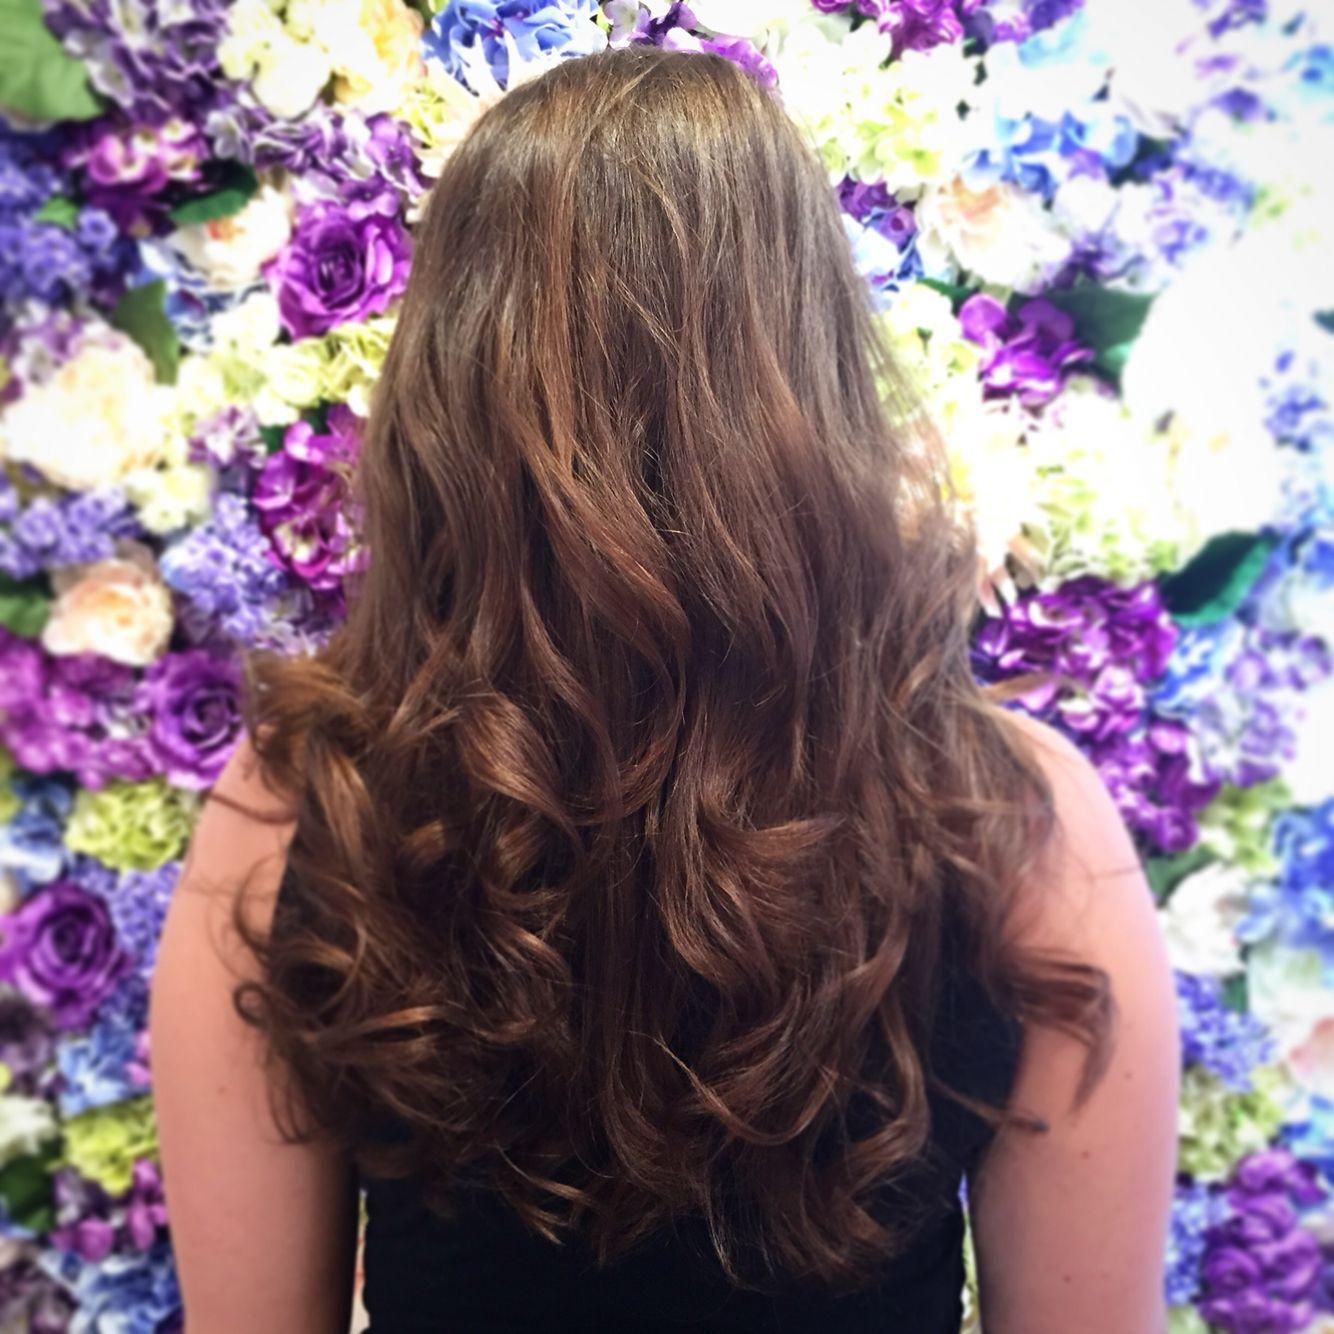 Oribe Signature Cut By Stylist Megan Farmer Oribe Oribeobsessed